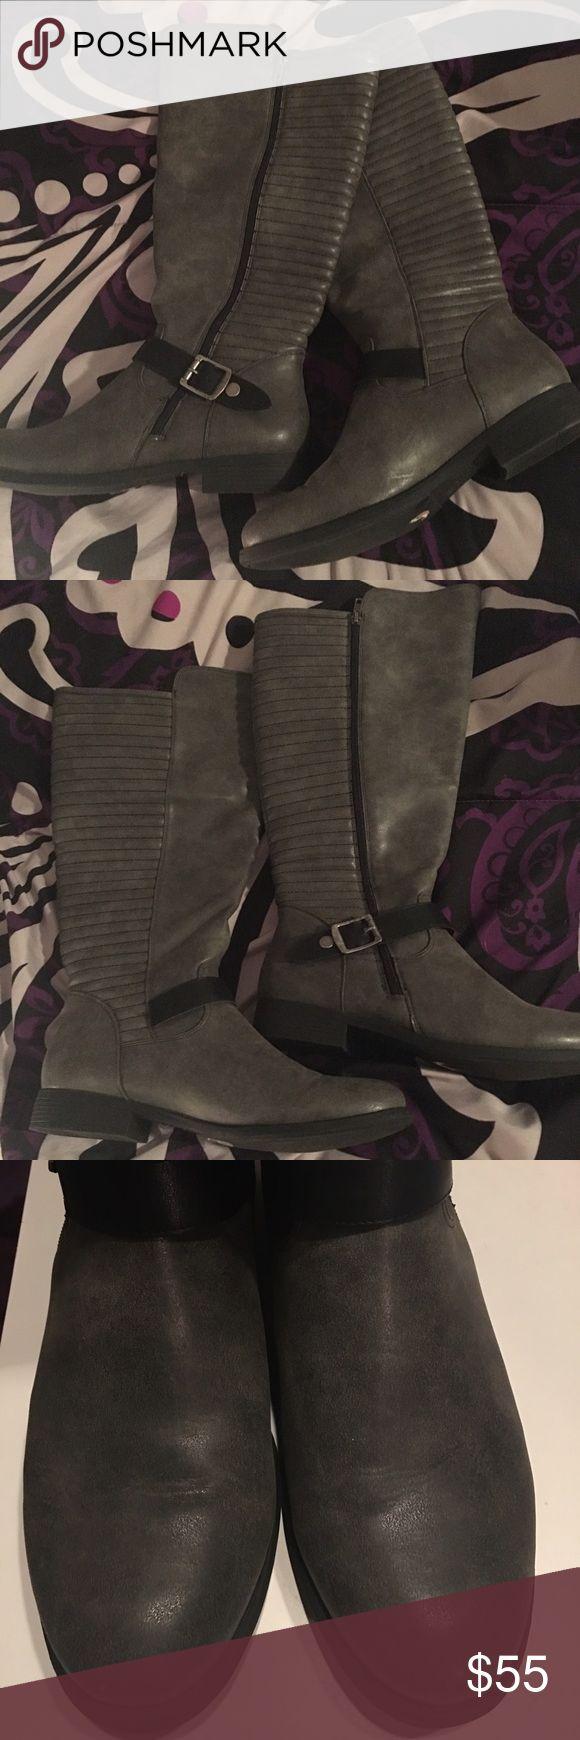 Brand new!!! Women's stylish sz 12 grey boots 🌹 NWOT Women's sz 12 grey boots never worn! Zip up! 🌻 with 1 inch heel 🌹 Nicole Shoes Heeled Boots